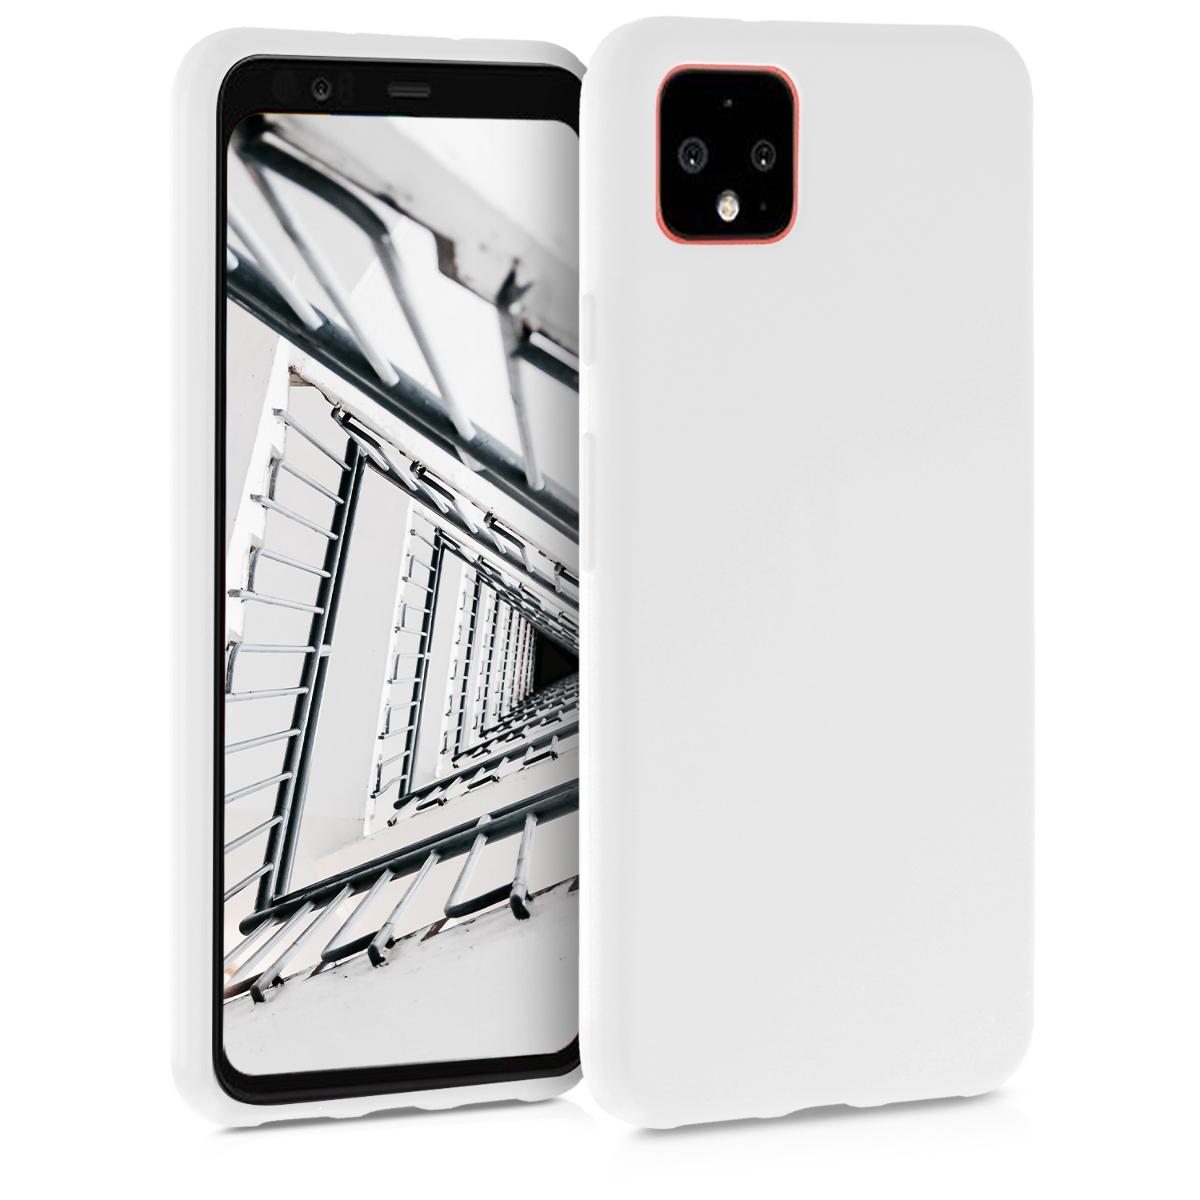 KW Θήκη Σιλικόνης Google Pixel 4 XL - White (50327.02)